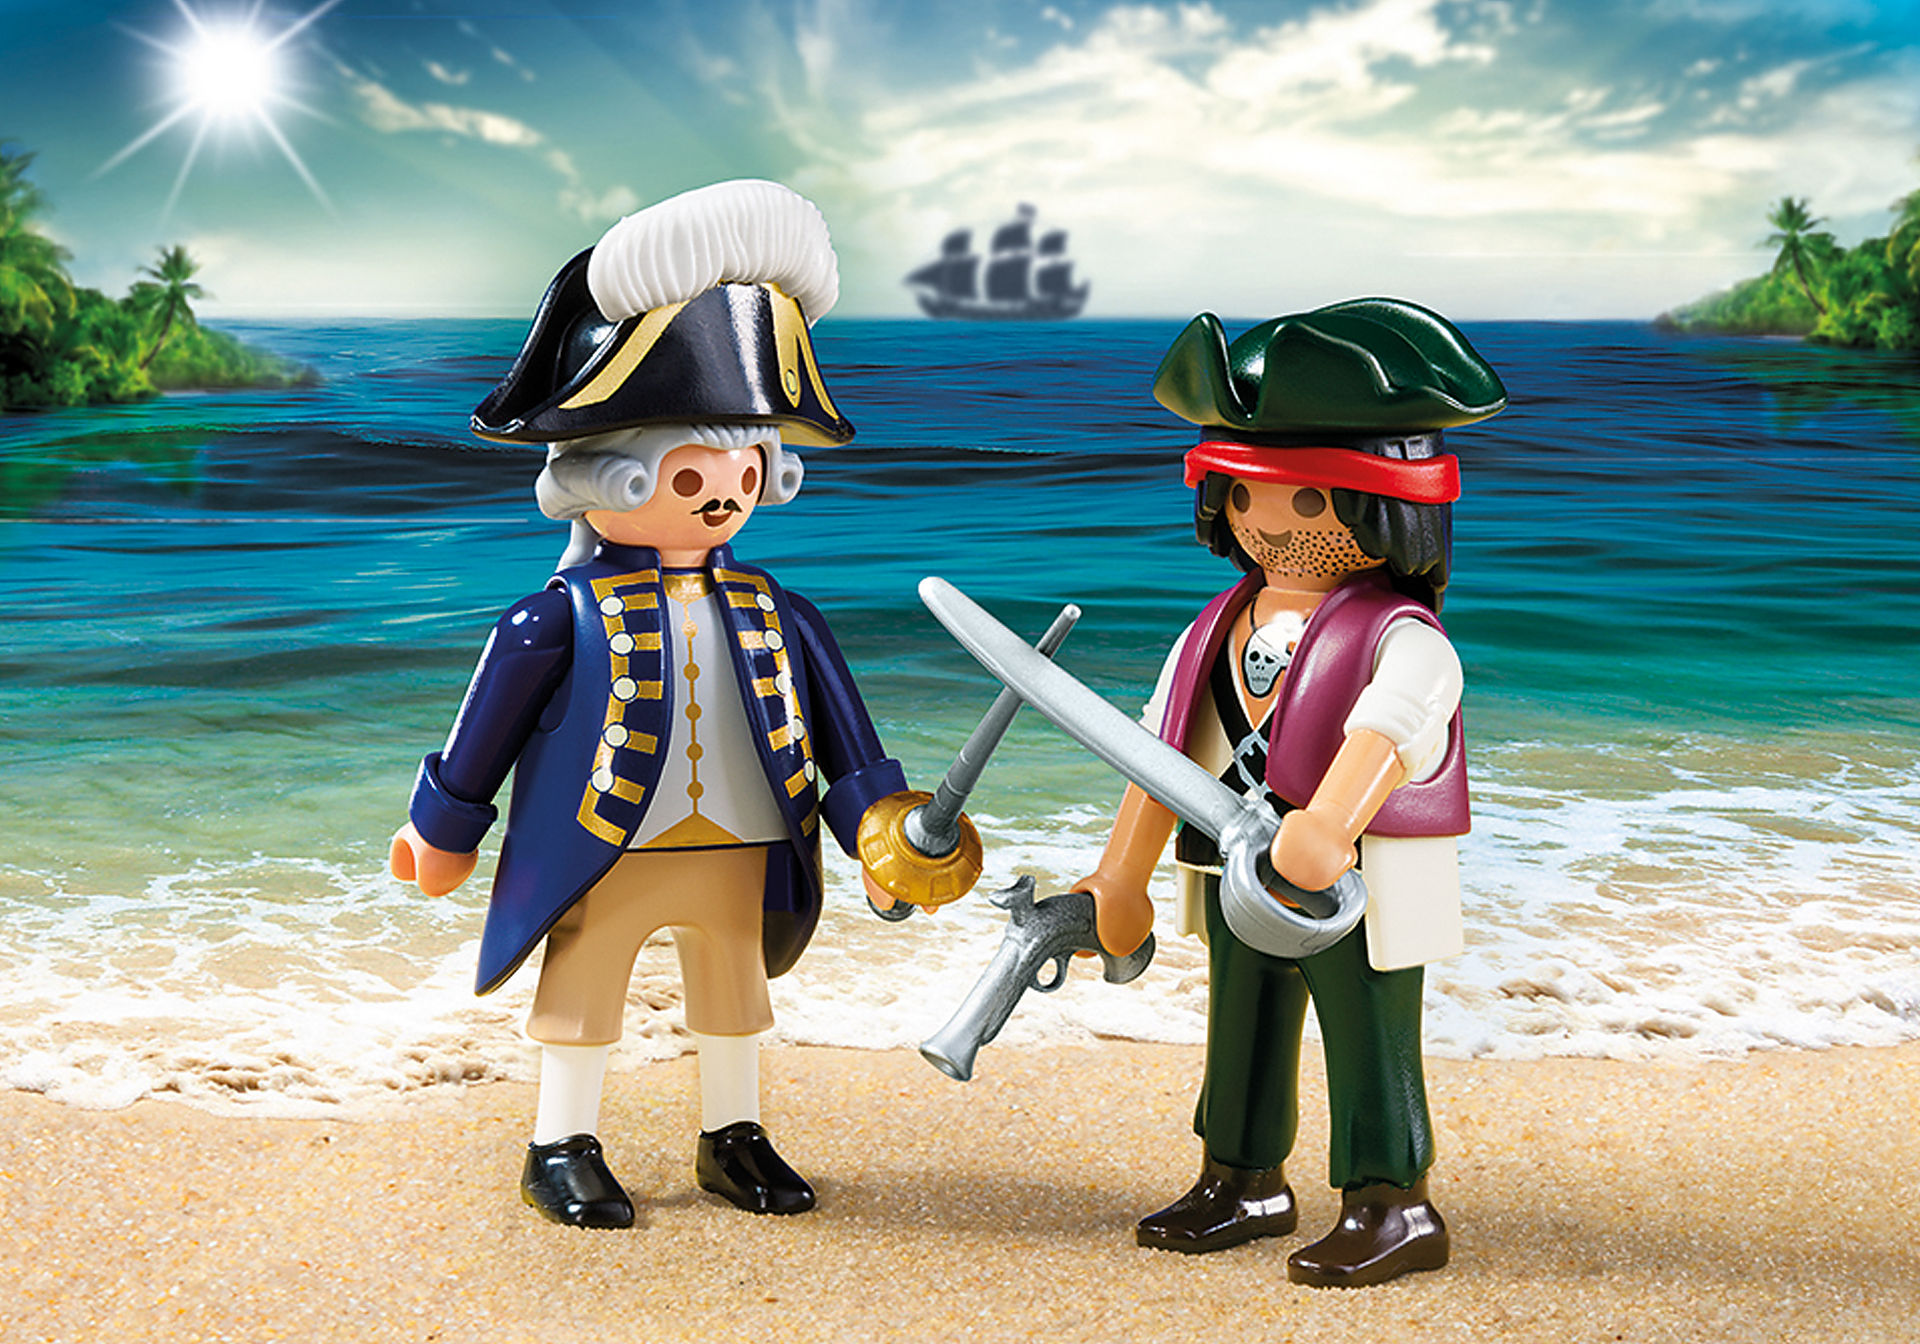 http://media.playmobil.com/i/playmobil/6846_product_detail/Duo Pack Pirata y Soldado